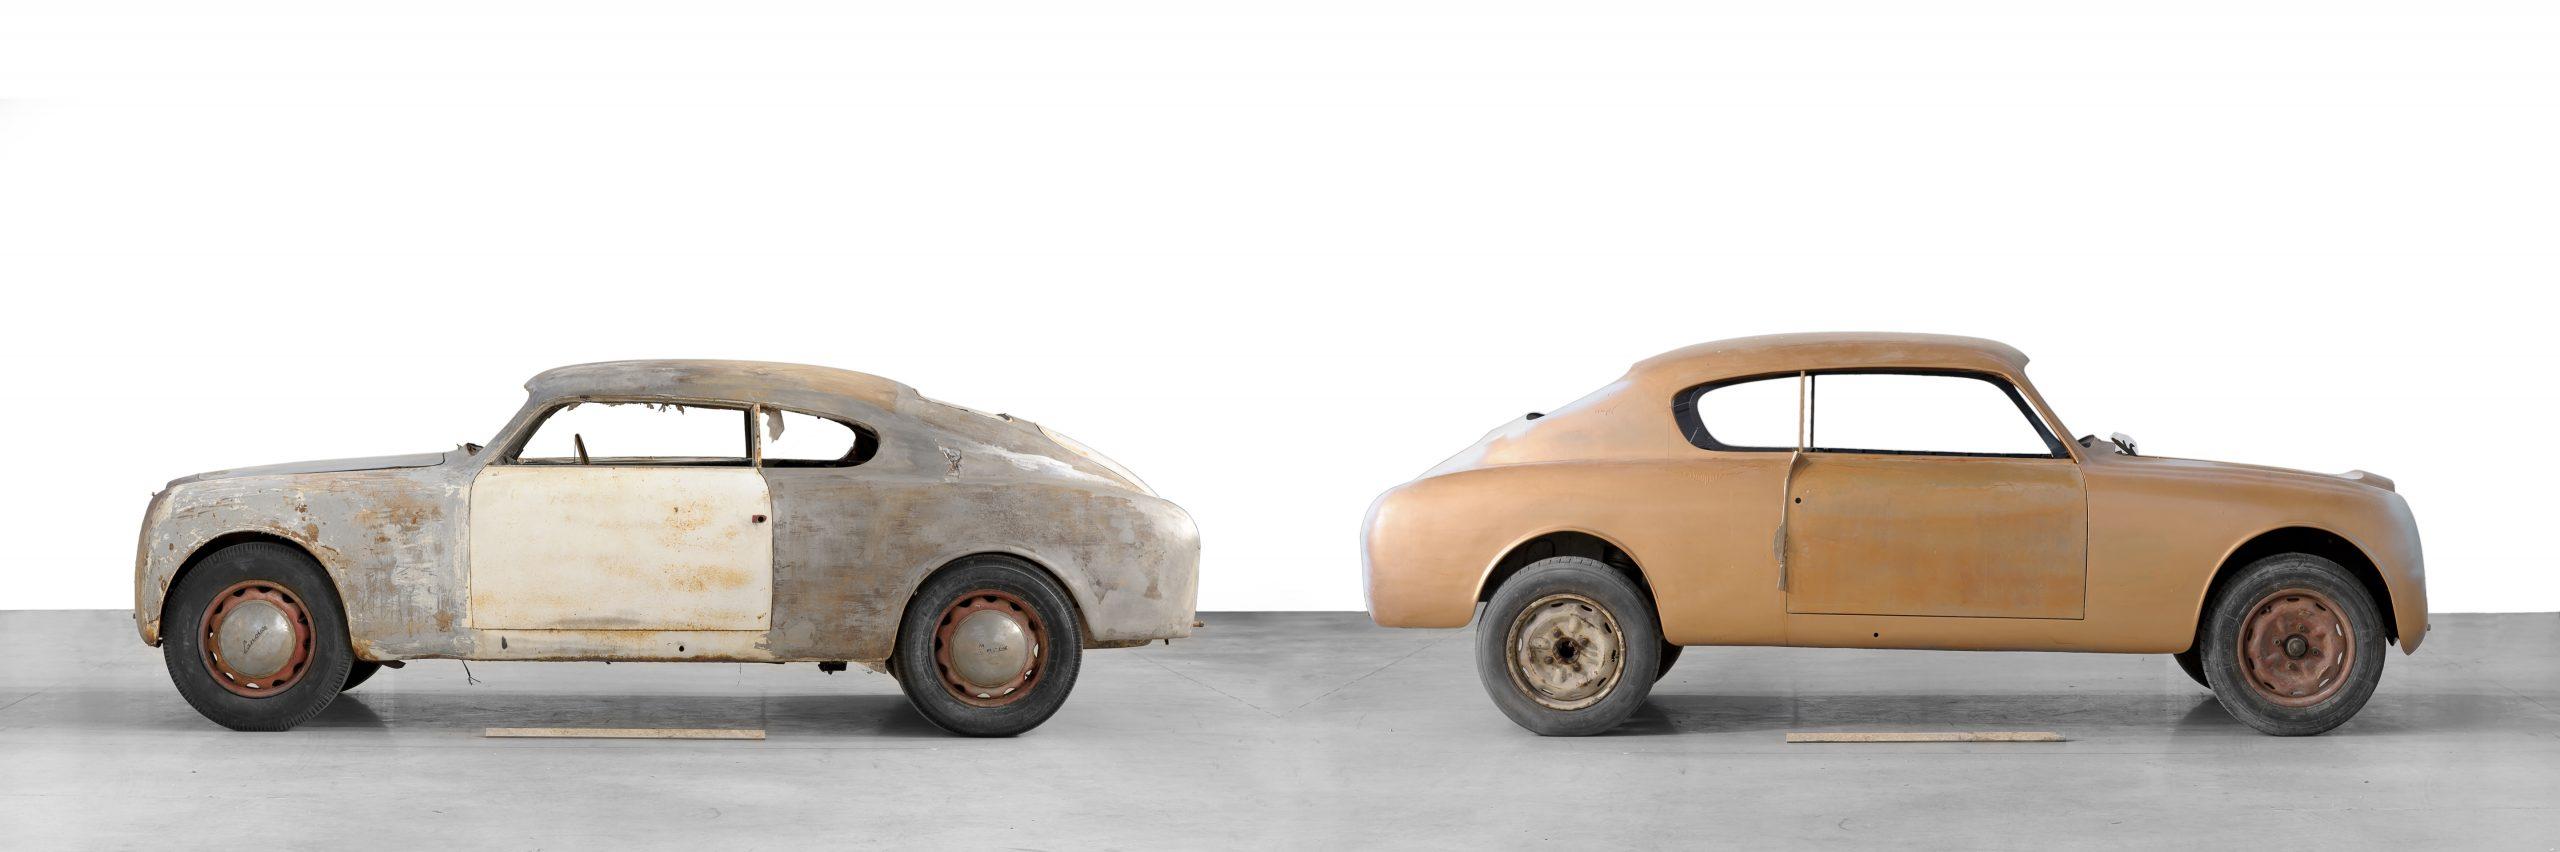 1951 Lancia Aurelia Bracco restoration profile